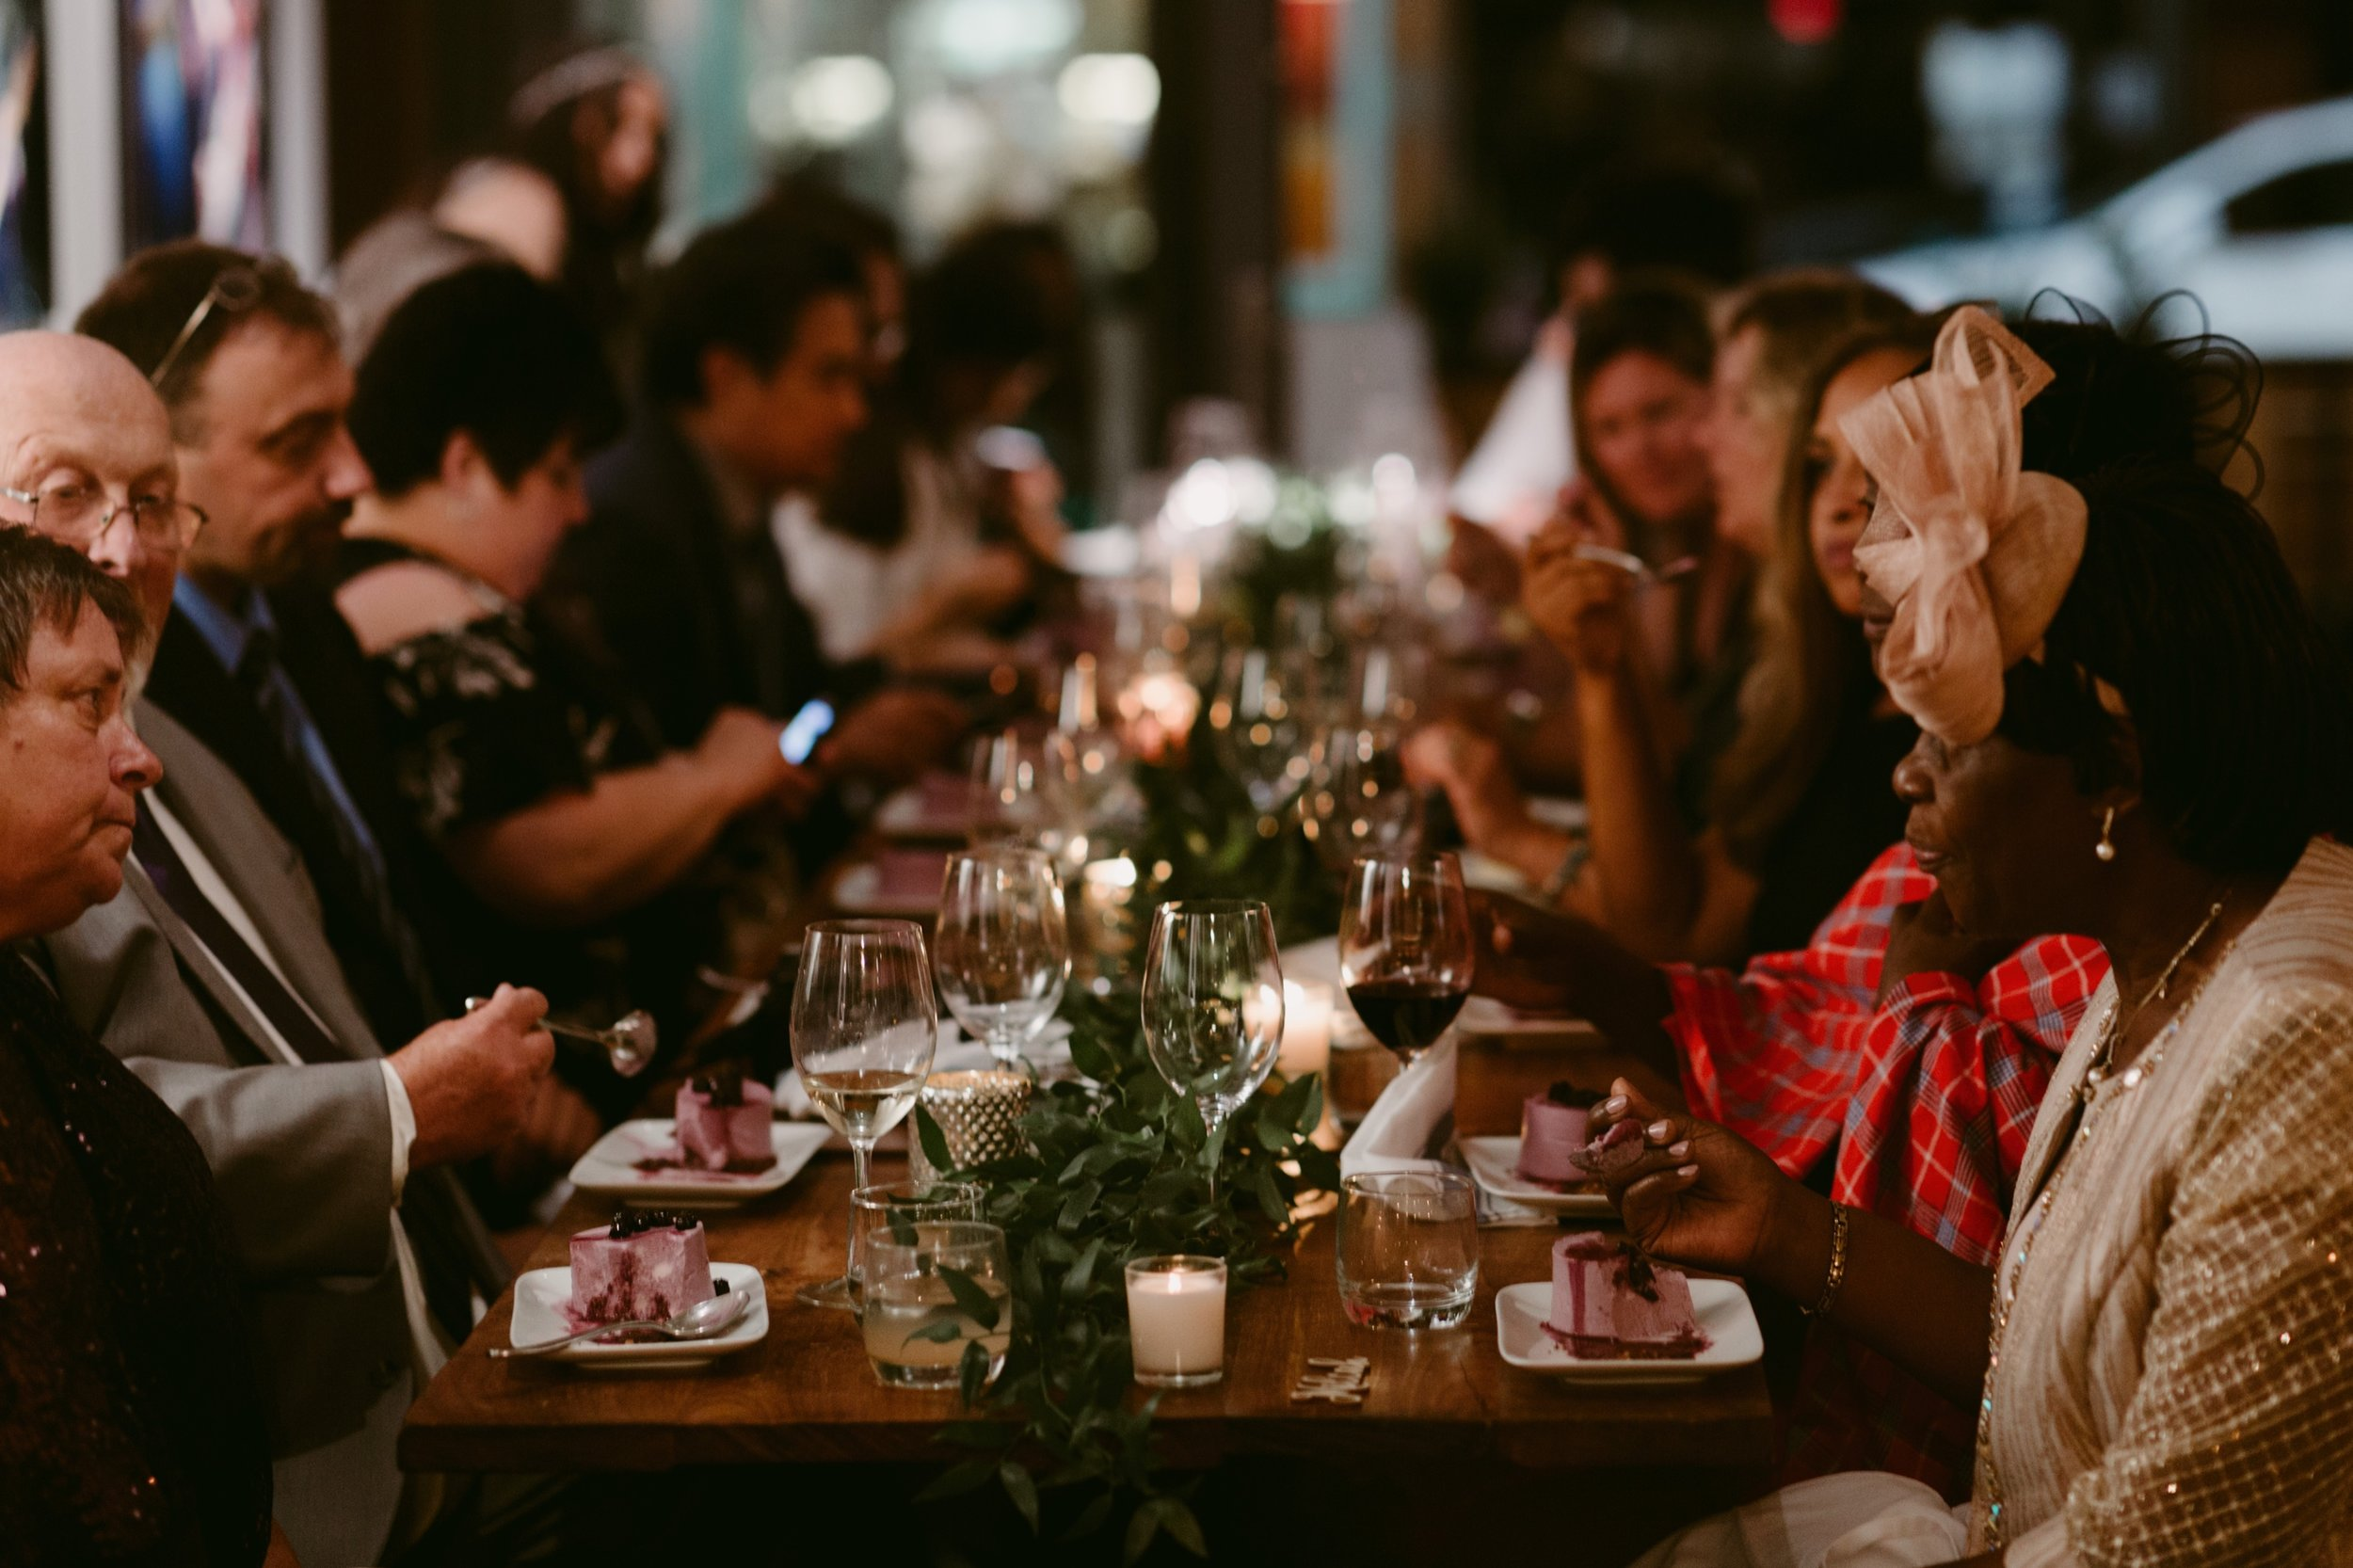 096_Spadina House Wedding (604 of 748)_intimate_Boehmer_Restaurant_Toronto_Wedding.jpg